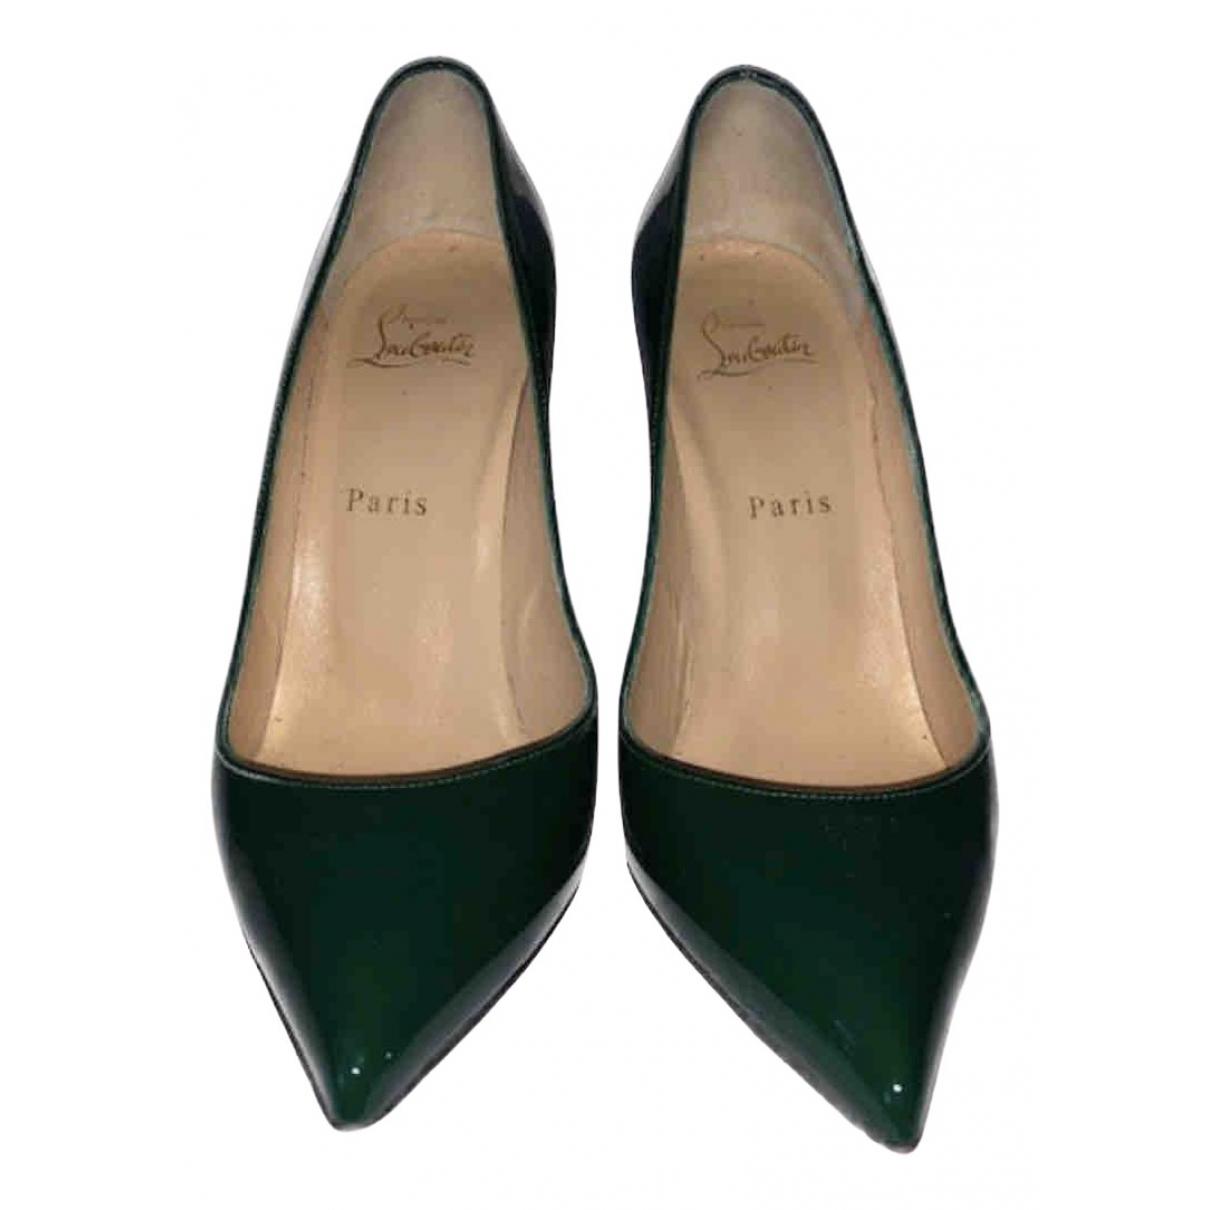 Christian Louboutin \N Green Patent leather Heels for Women 38.5 EU